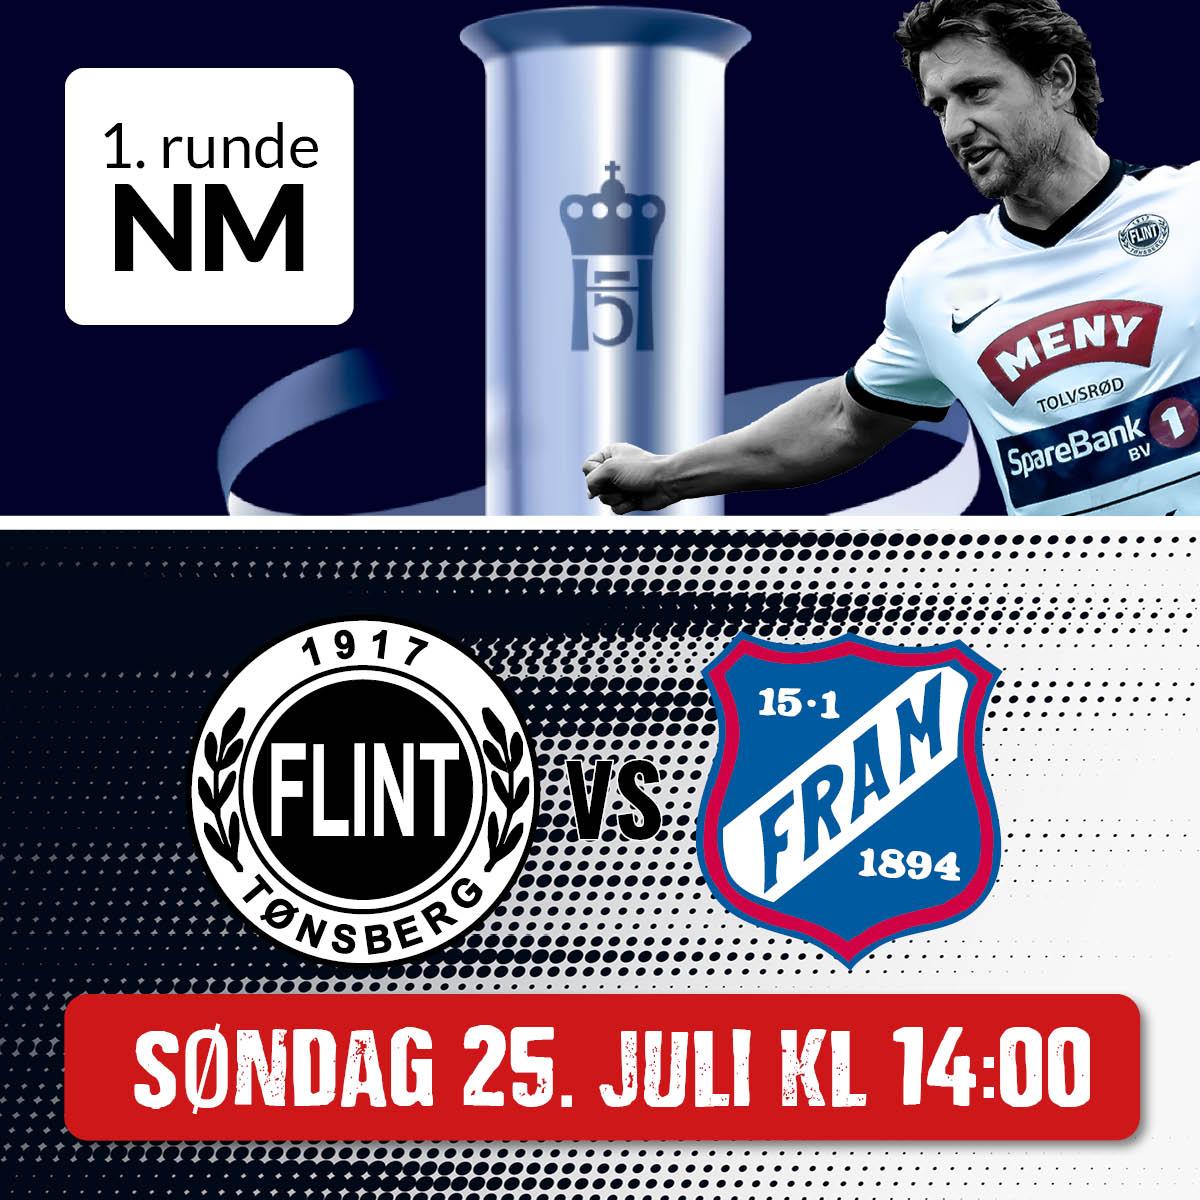 https://www.flintfotball.no/wp-content/uploads/2021/06/NM-1.runde-Flint-vs-Fram-Larvik_-1200x1200-1.jpg